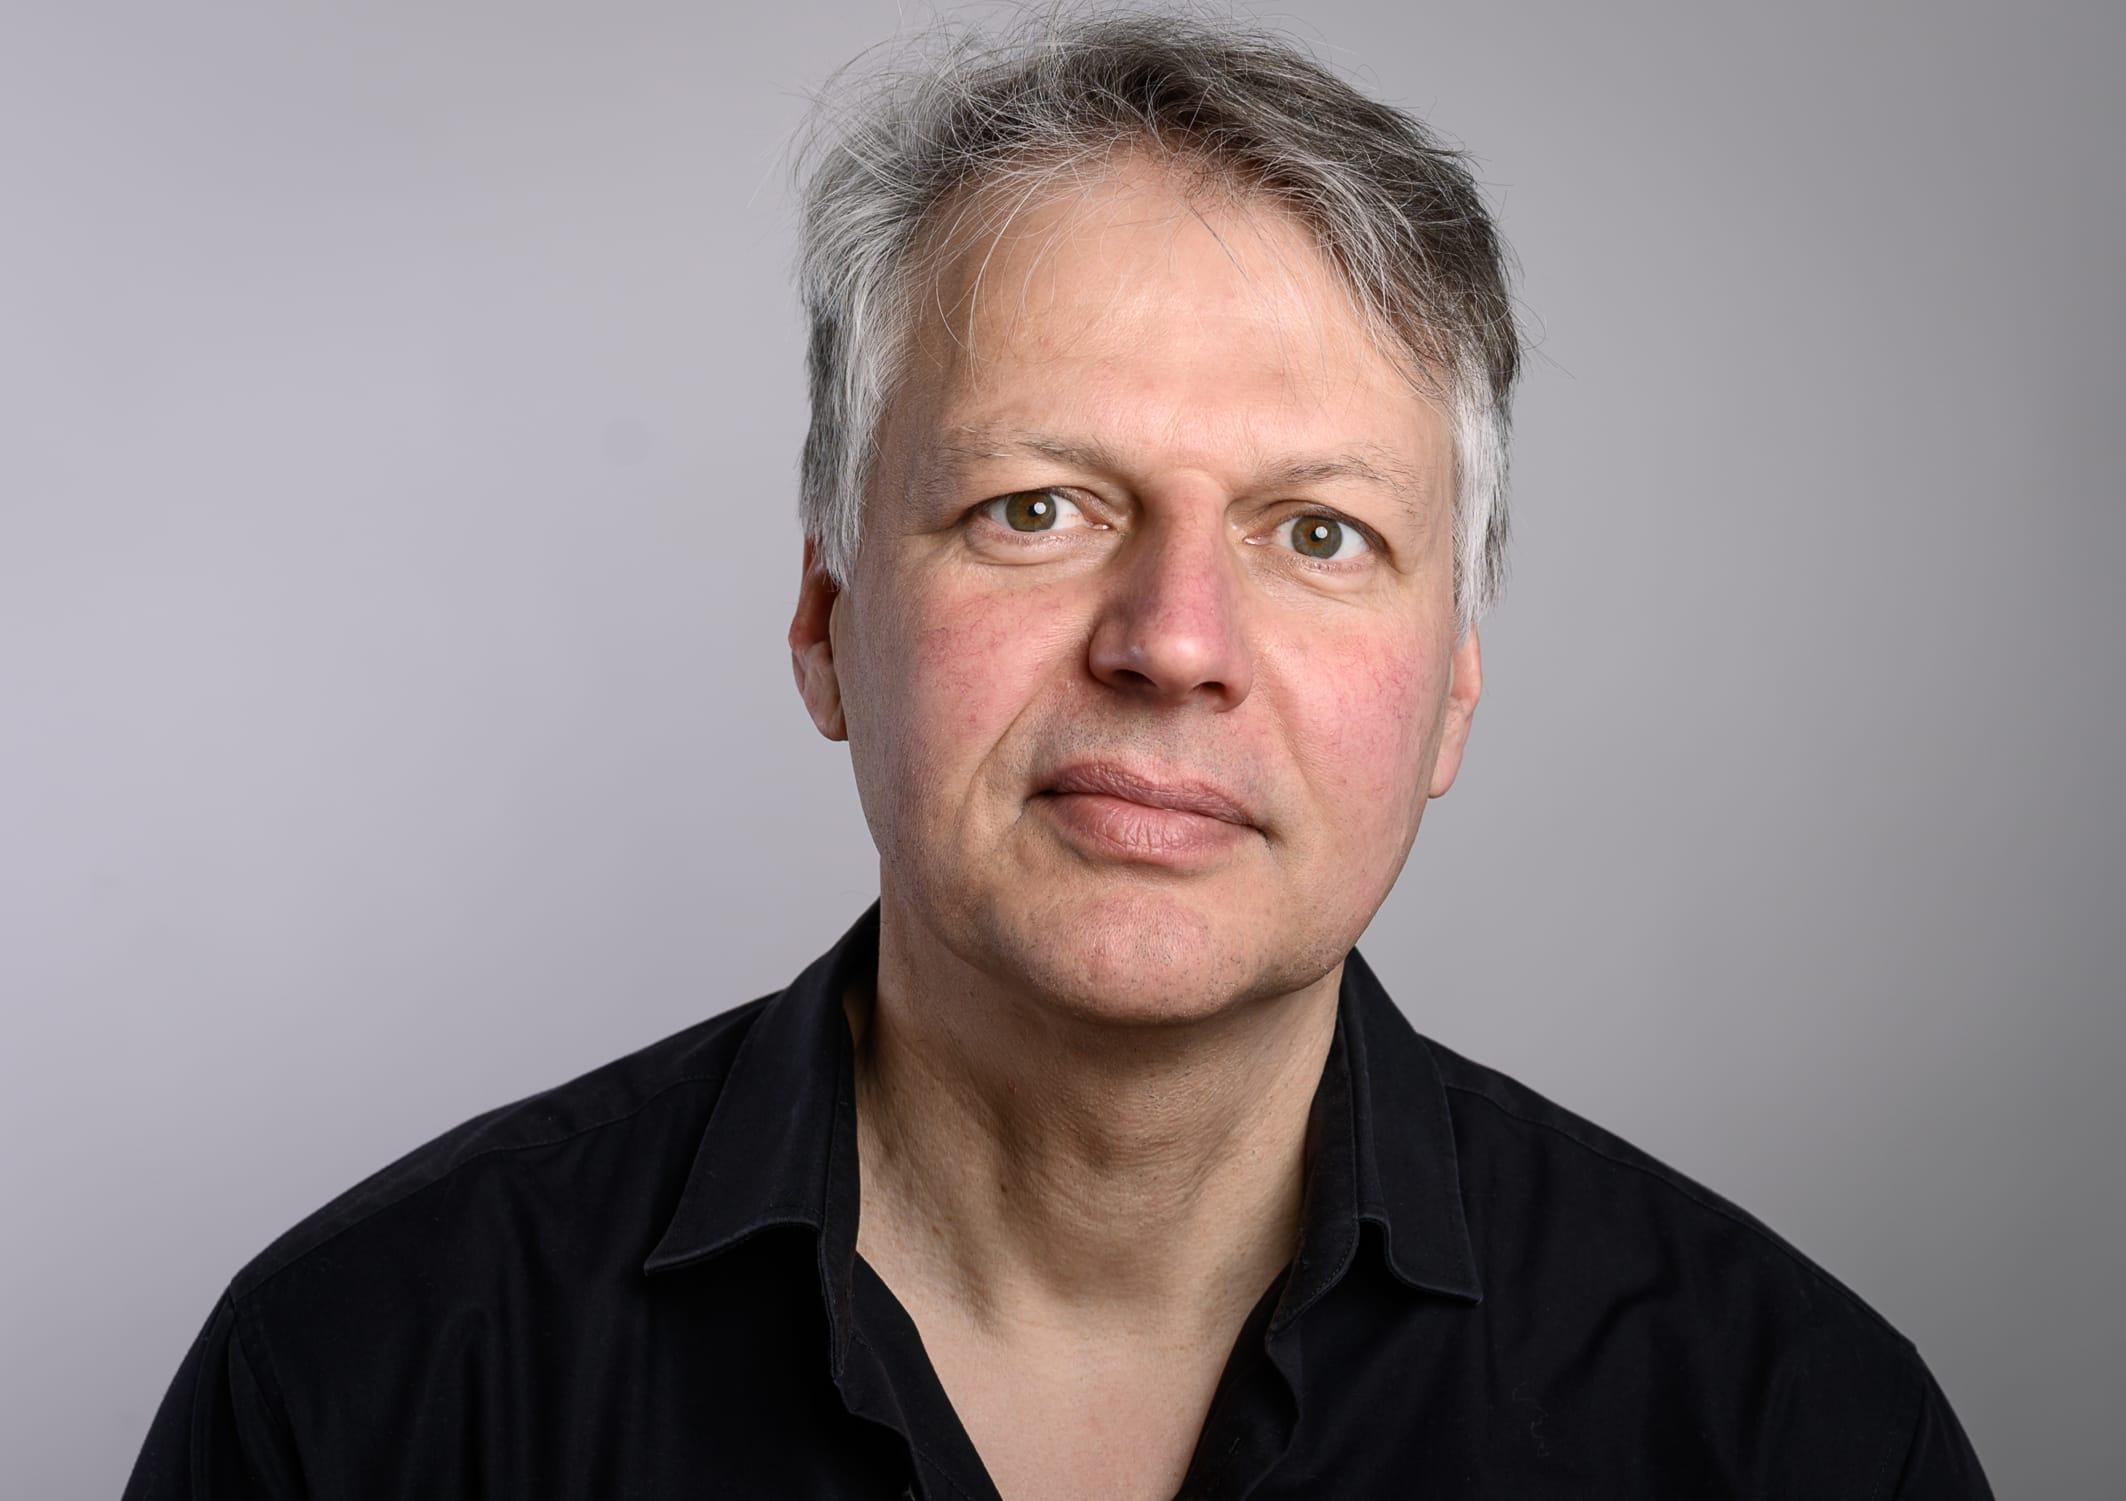 portrait Foto von Michael Rappold